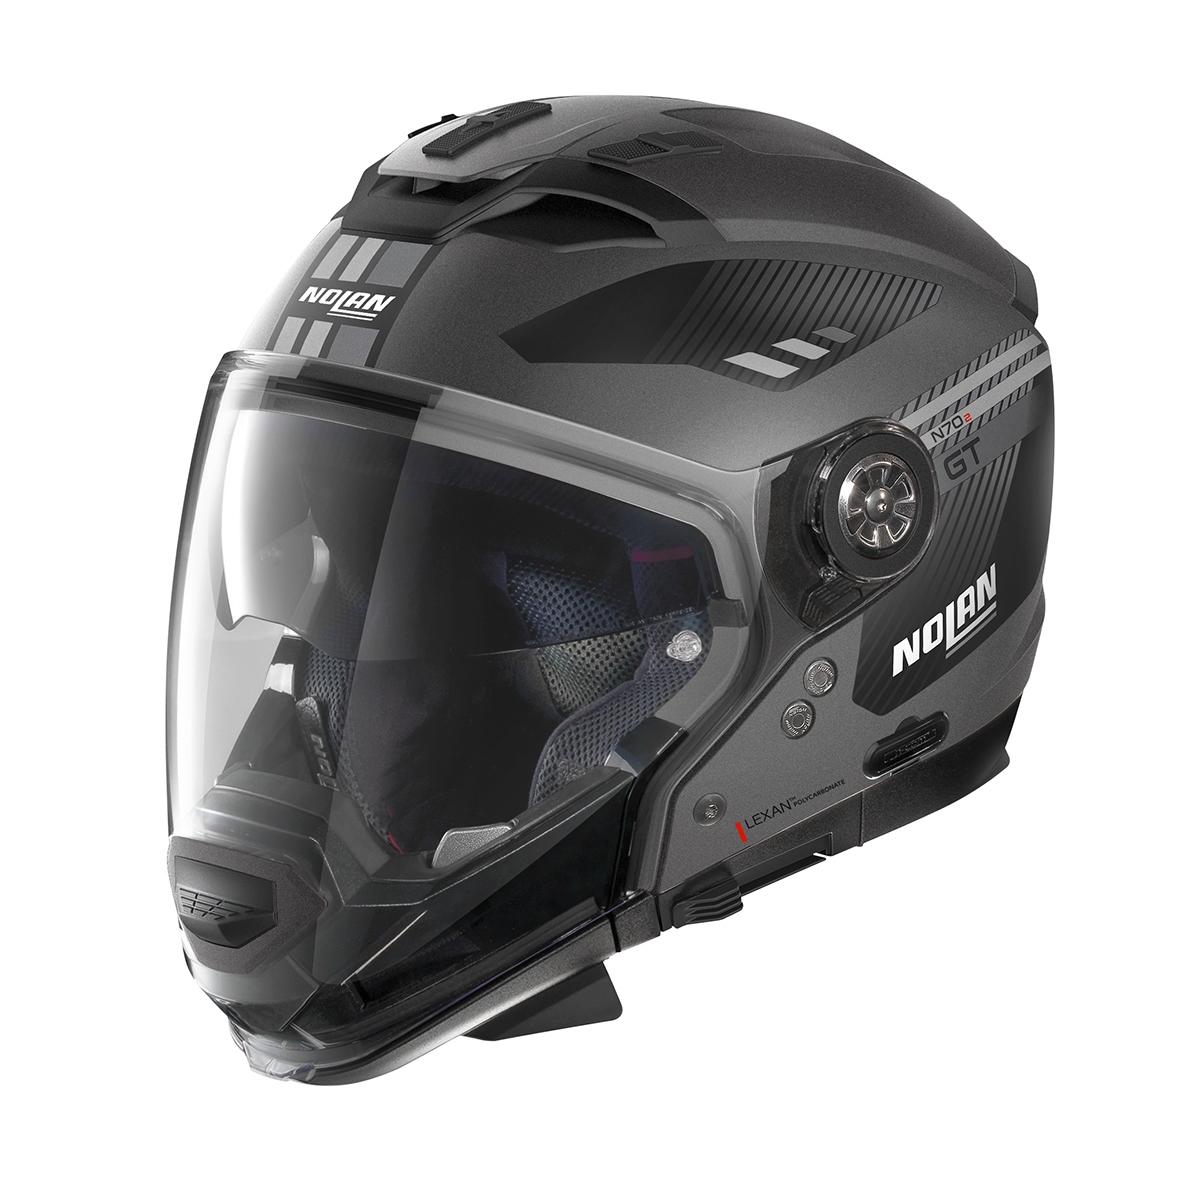 Moto helma Nolan N70-2 GT Bellavista N-Com Flat Lava Grey 21